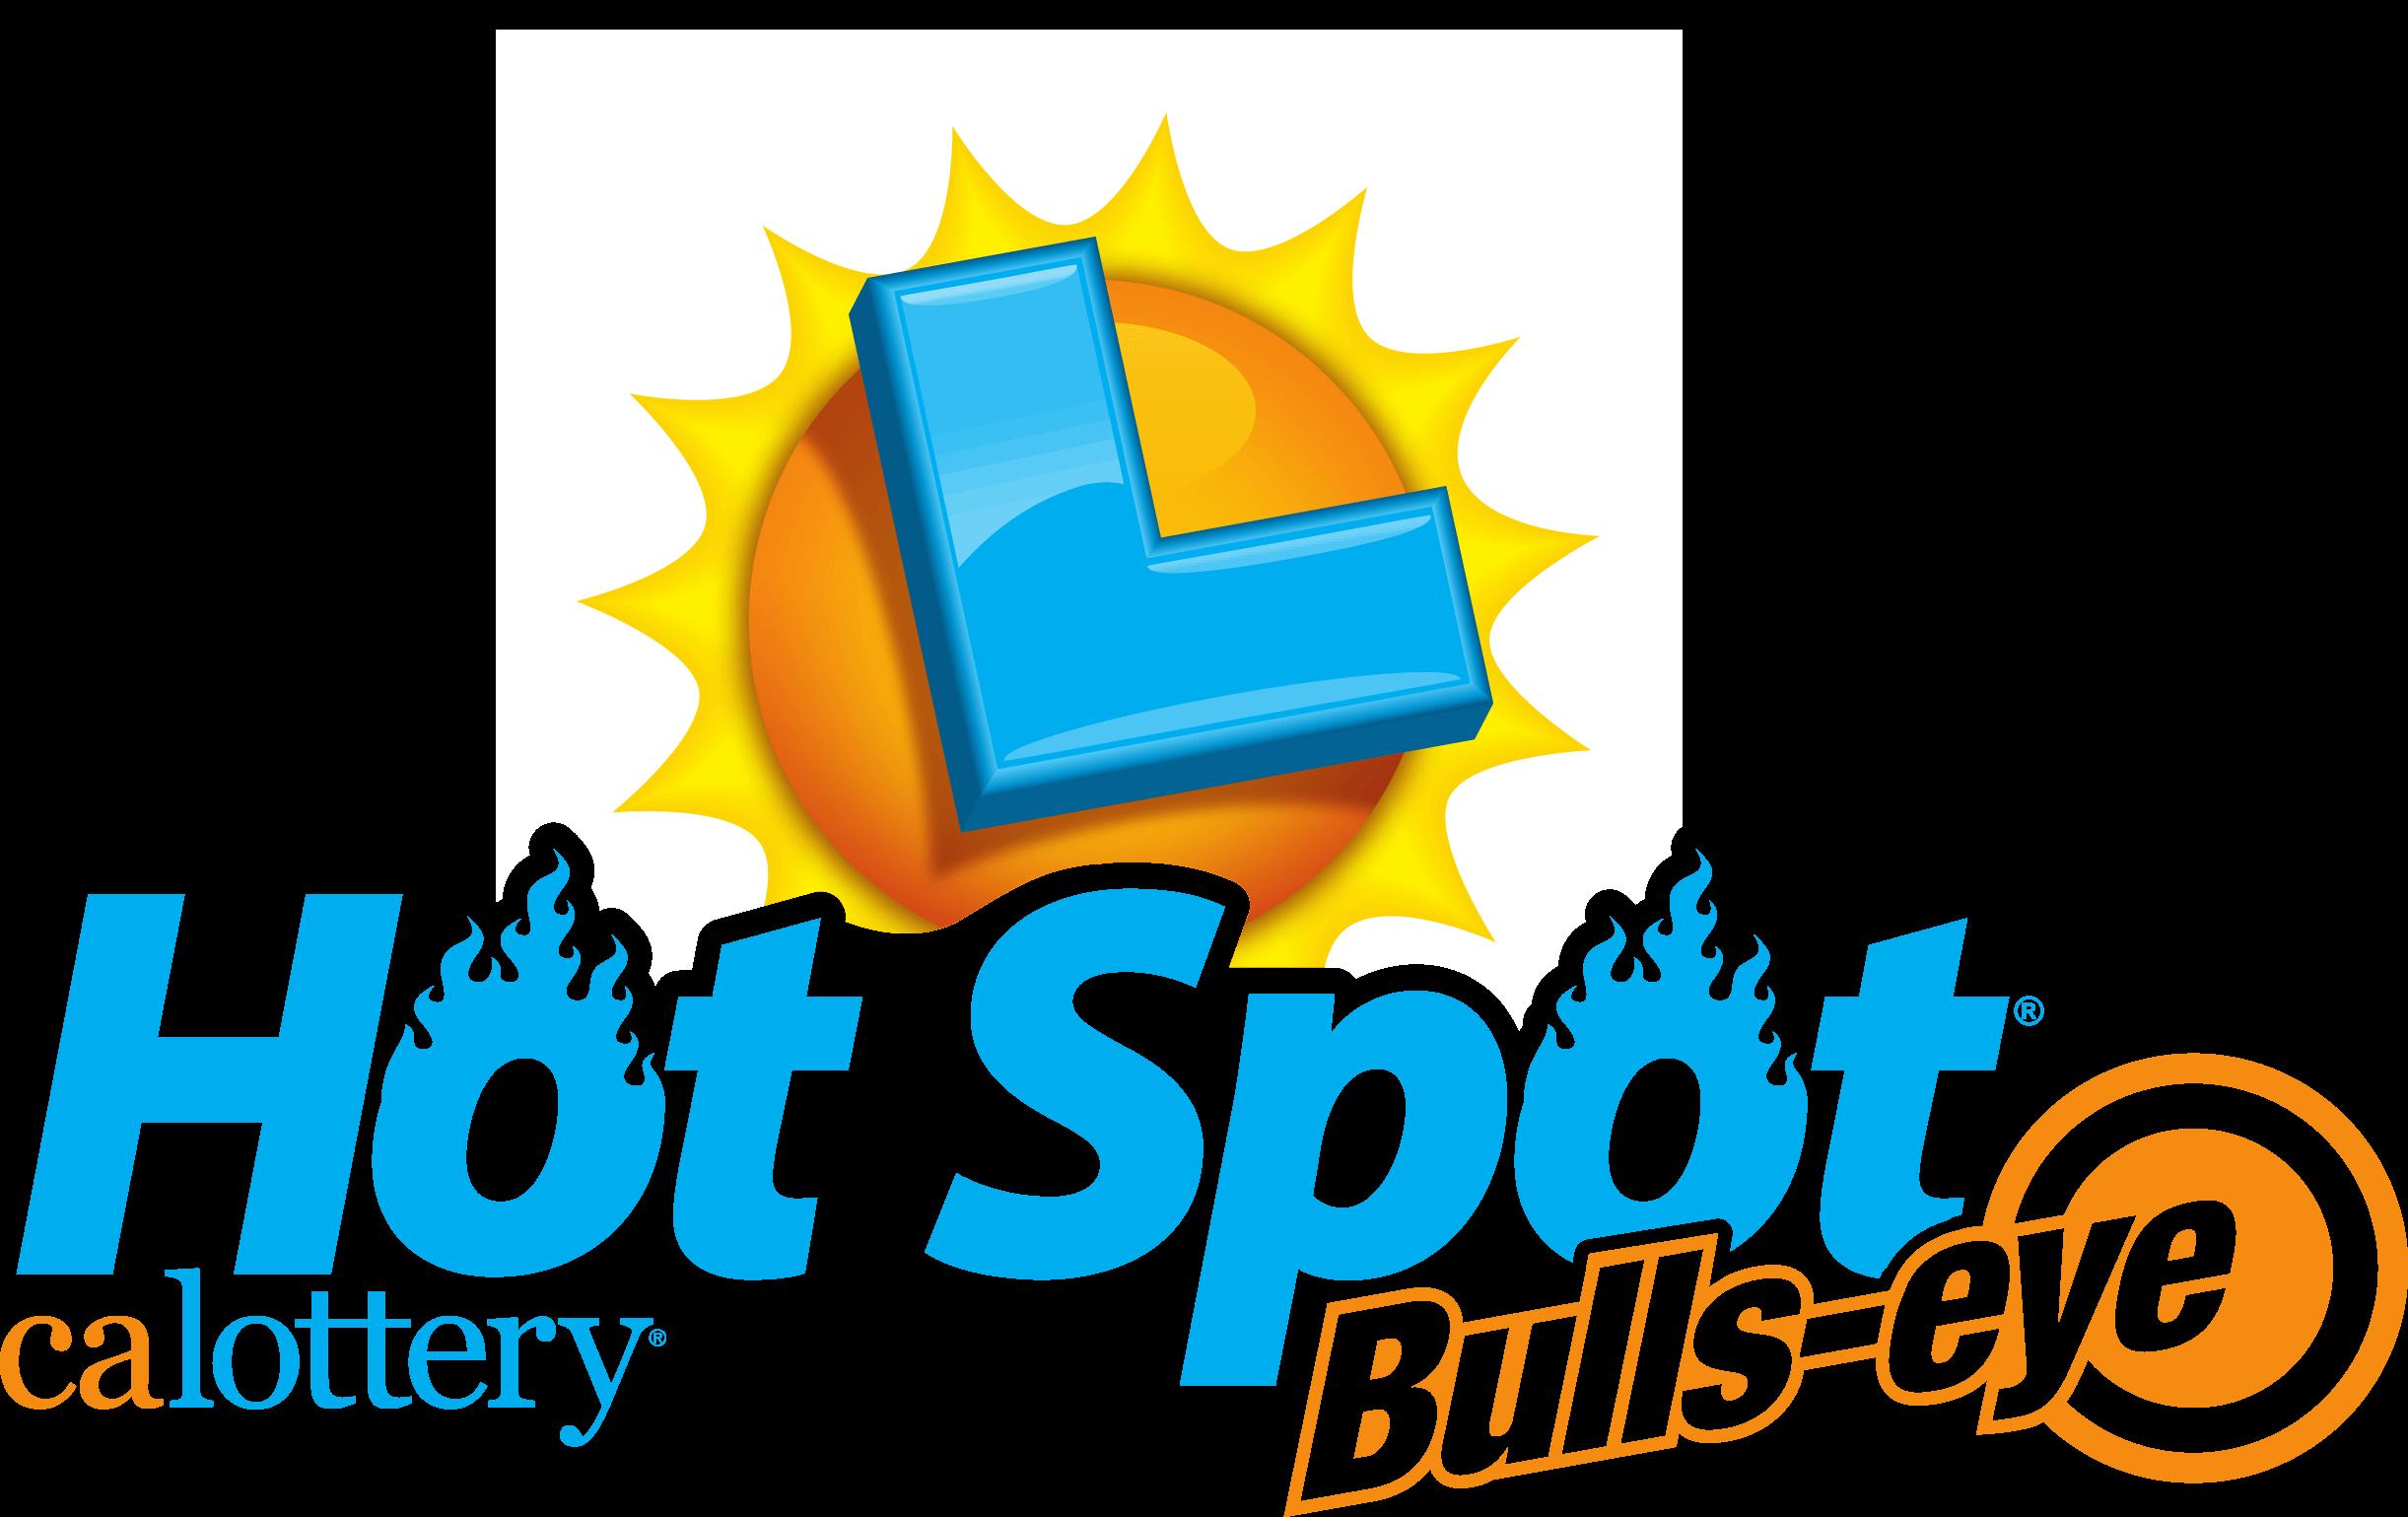 Hot Spot Bulls-eye, calottery